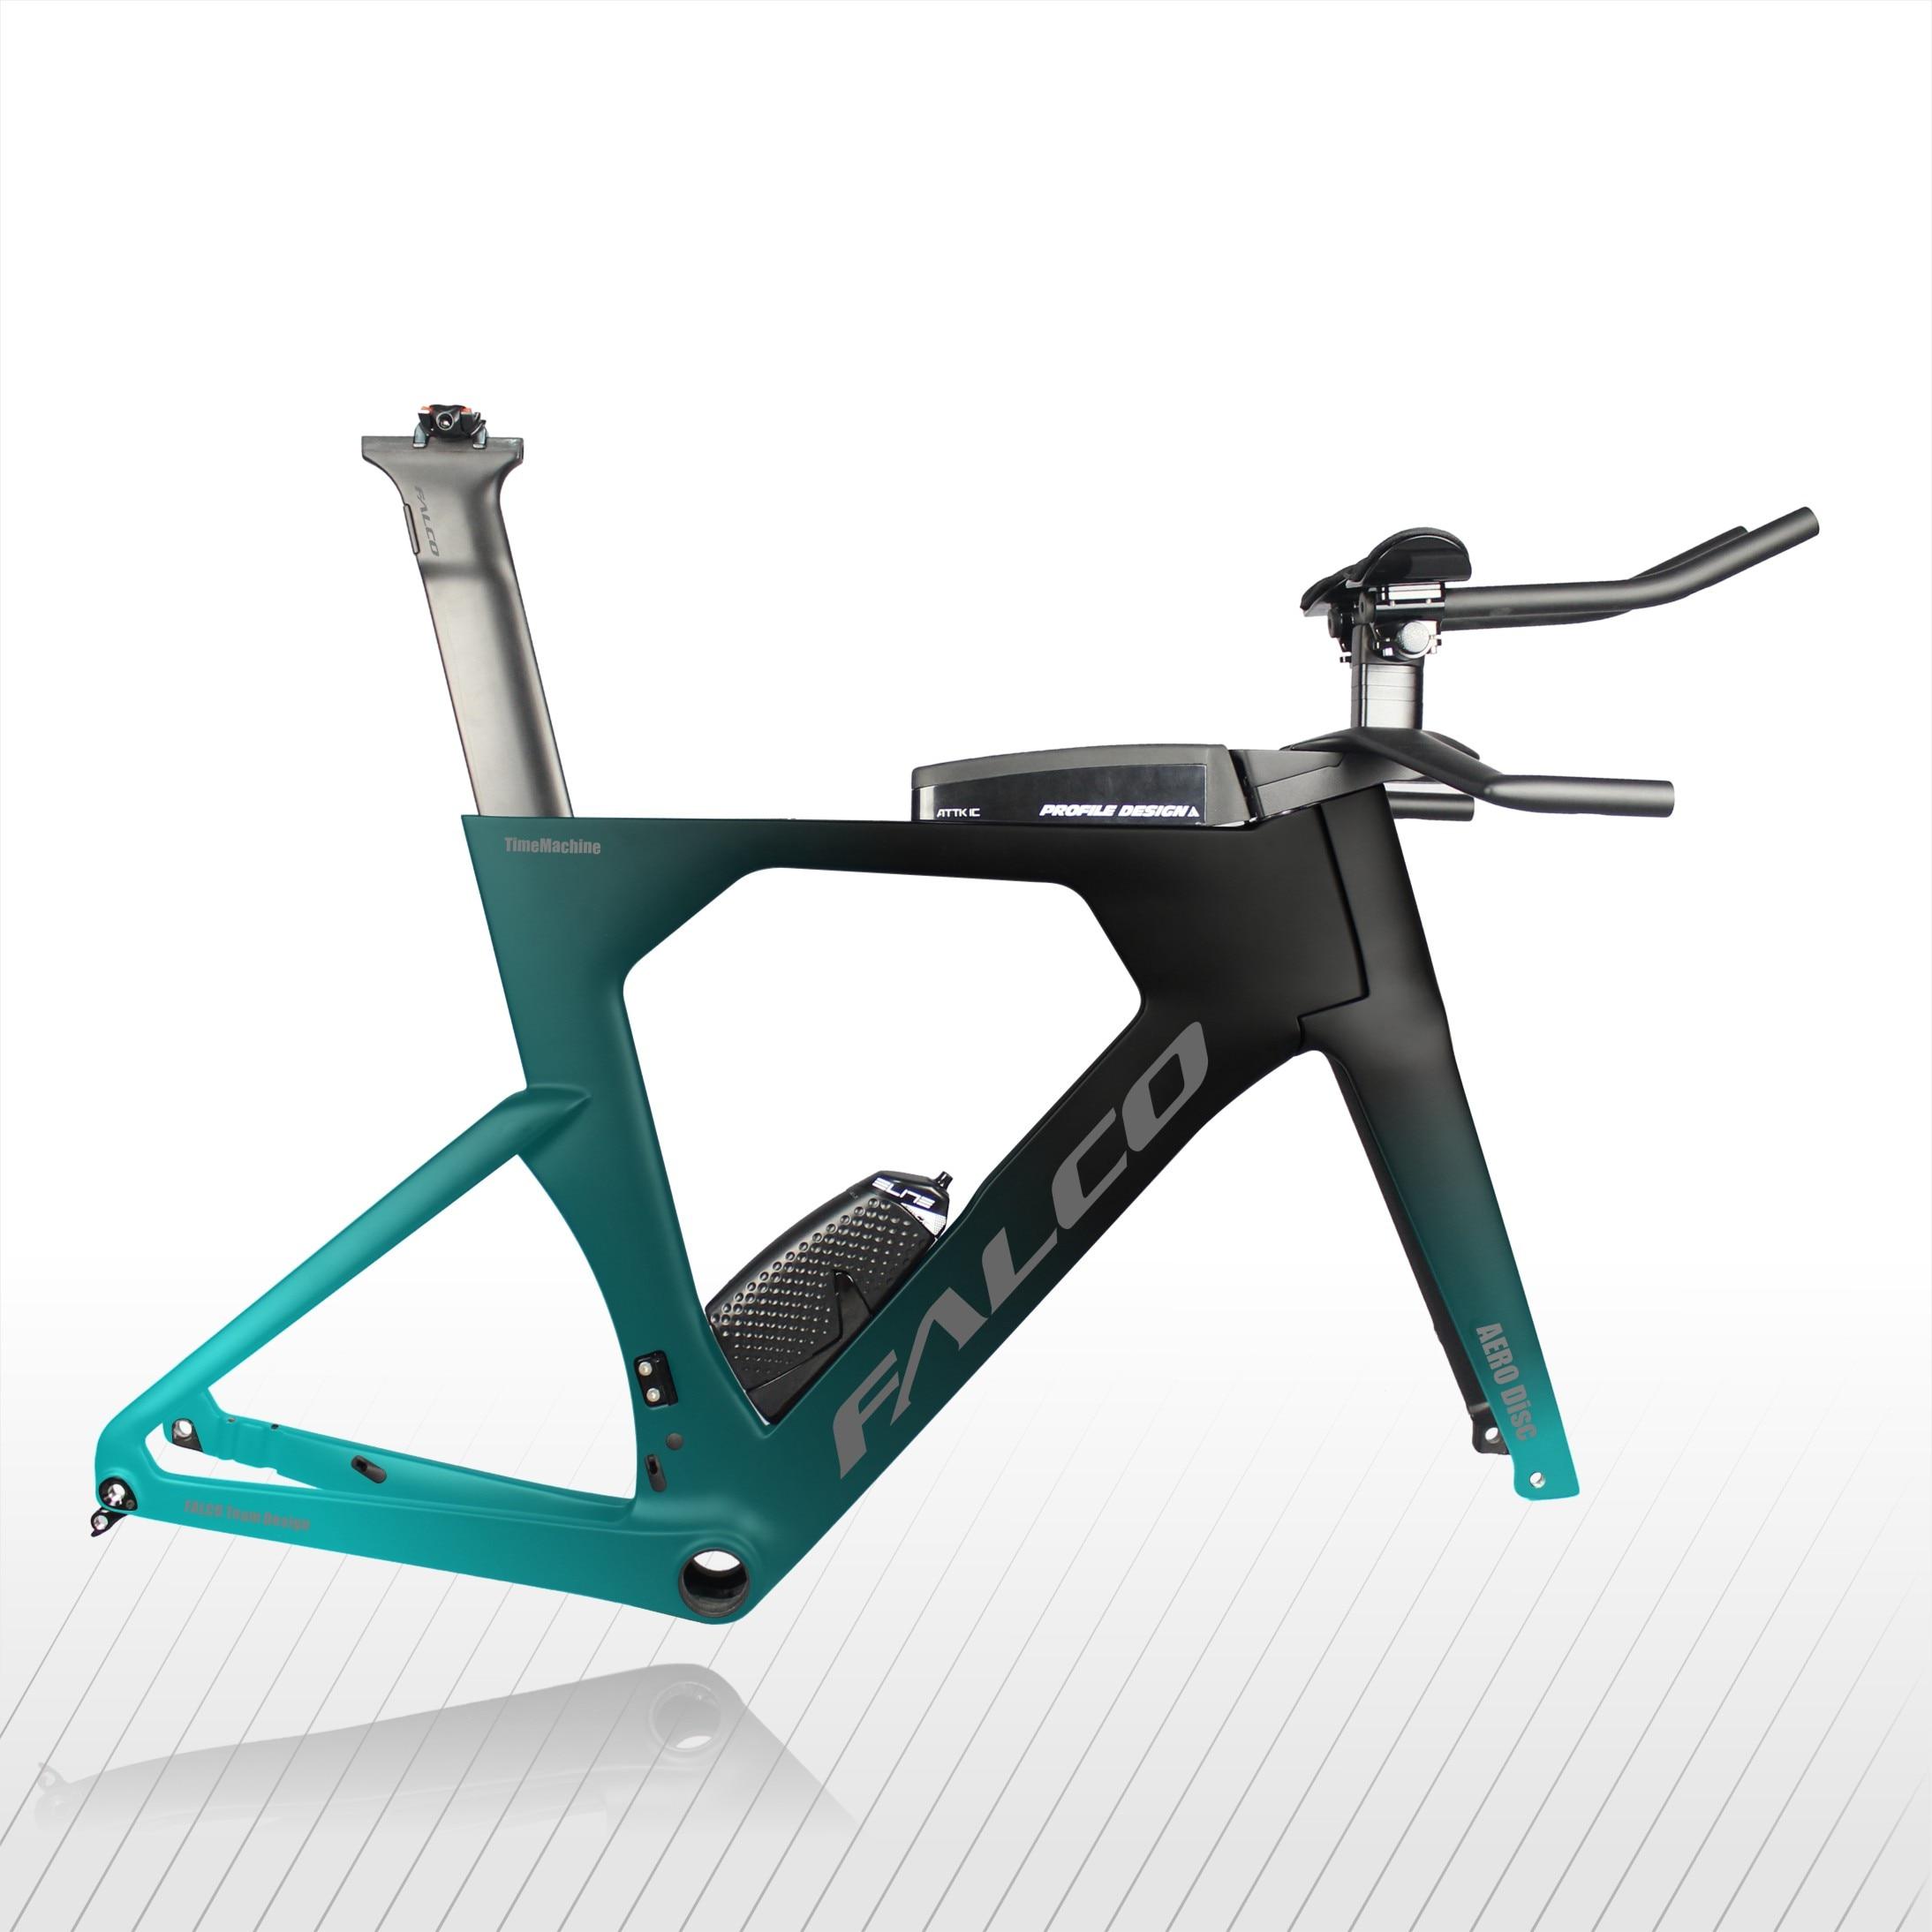 FALCO TT Frame Time Trial Triathlon Bicycle Bike Part Carbon Custom Painting Frame With Handlebar Seatpost TT912